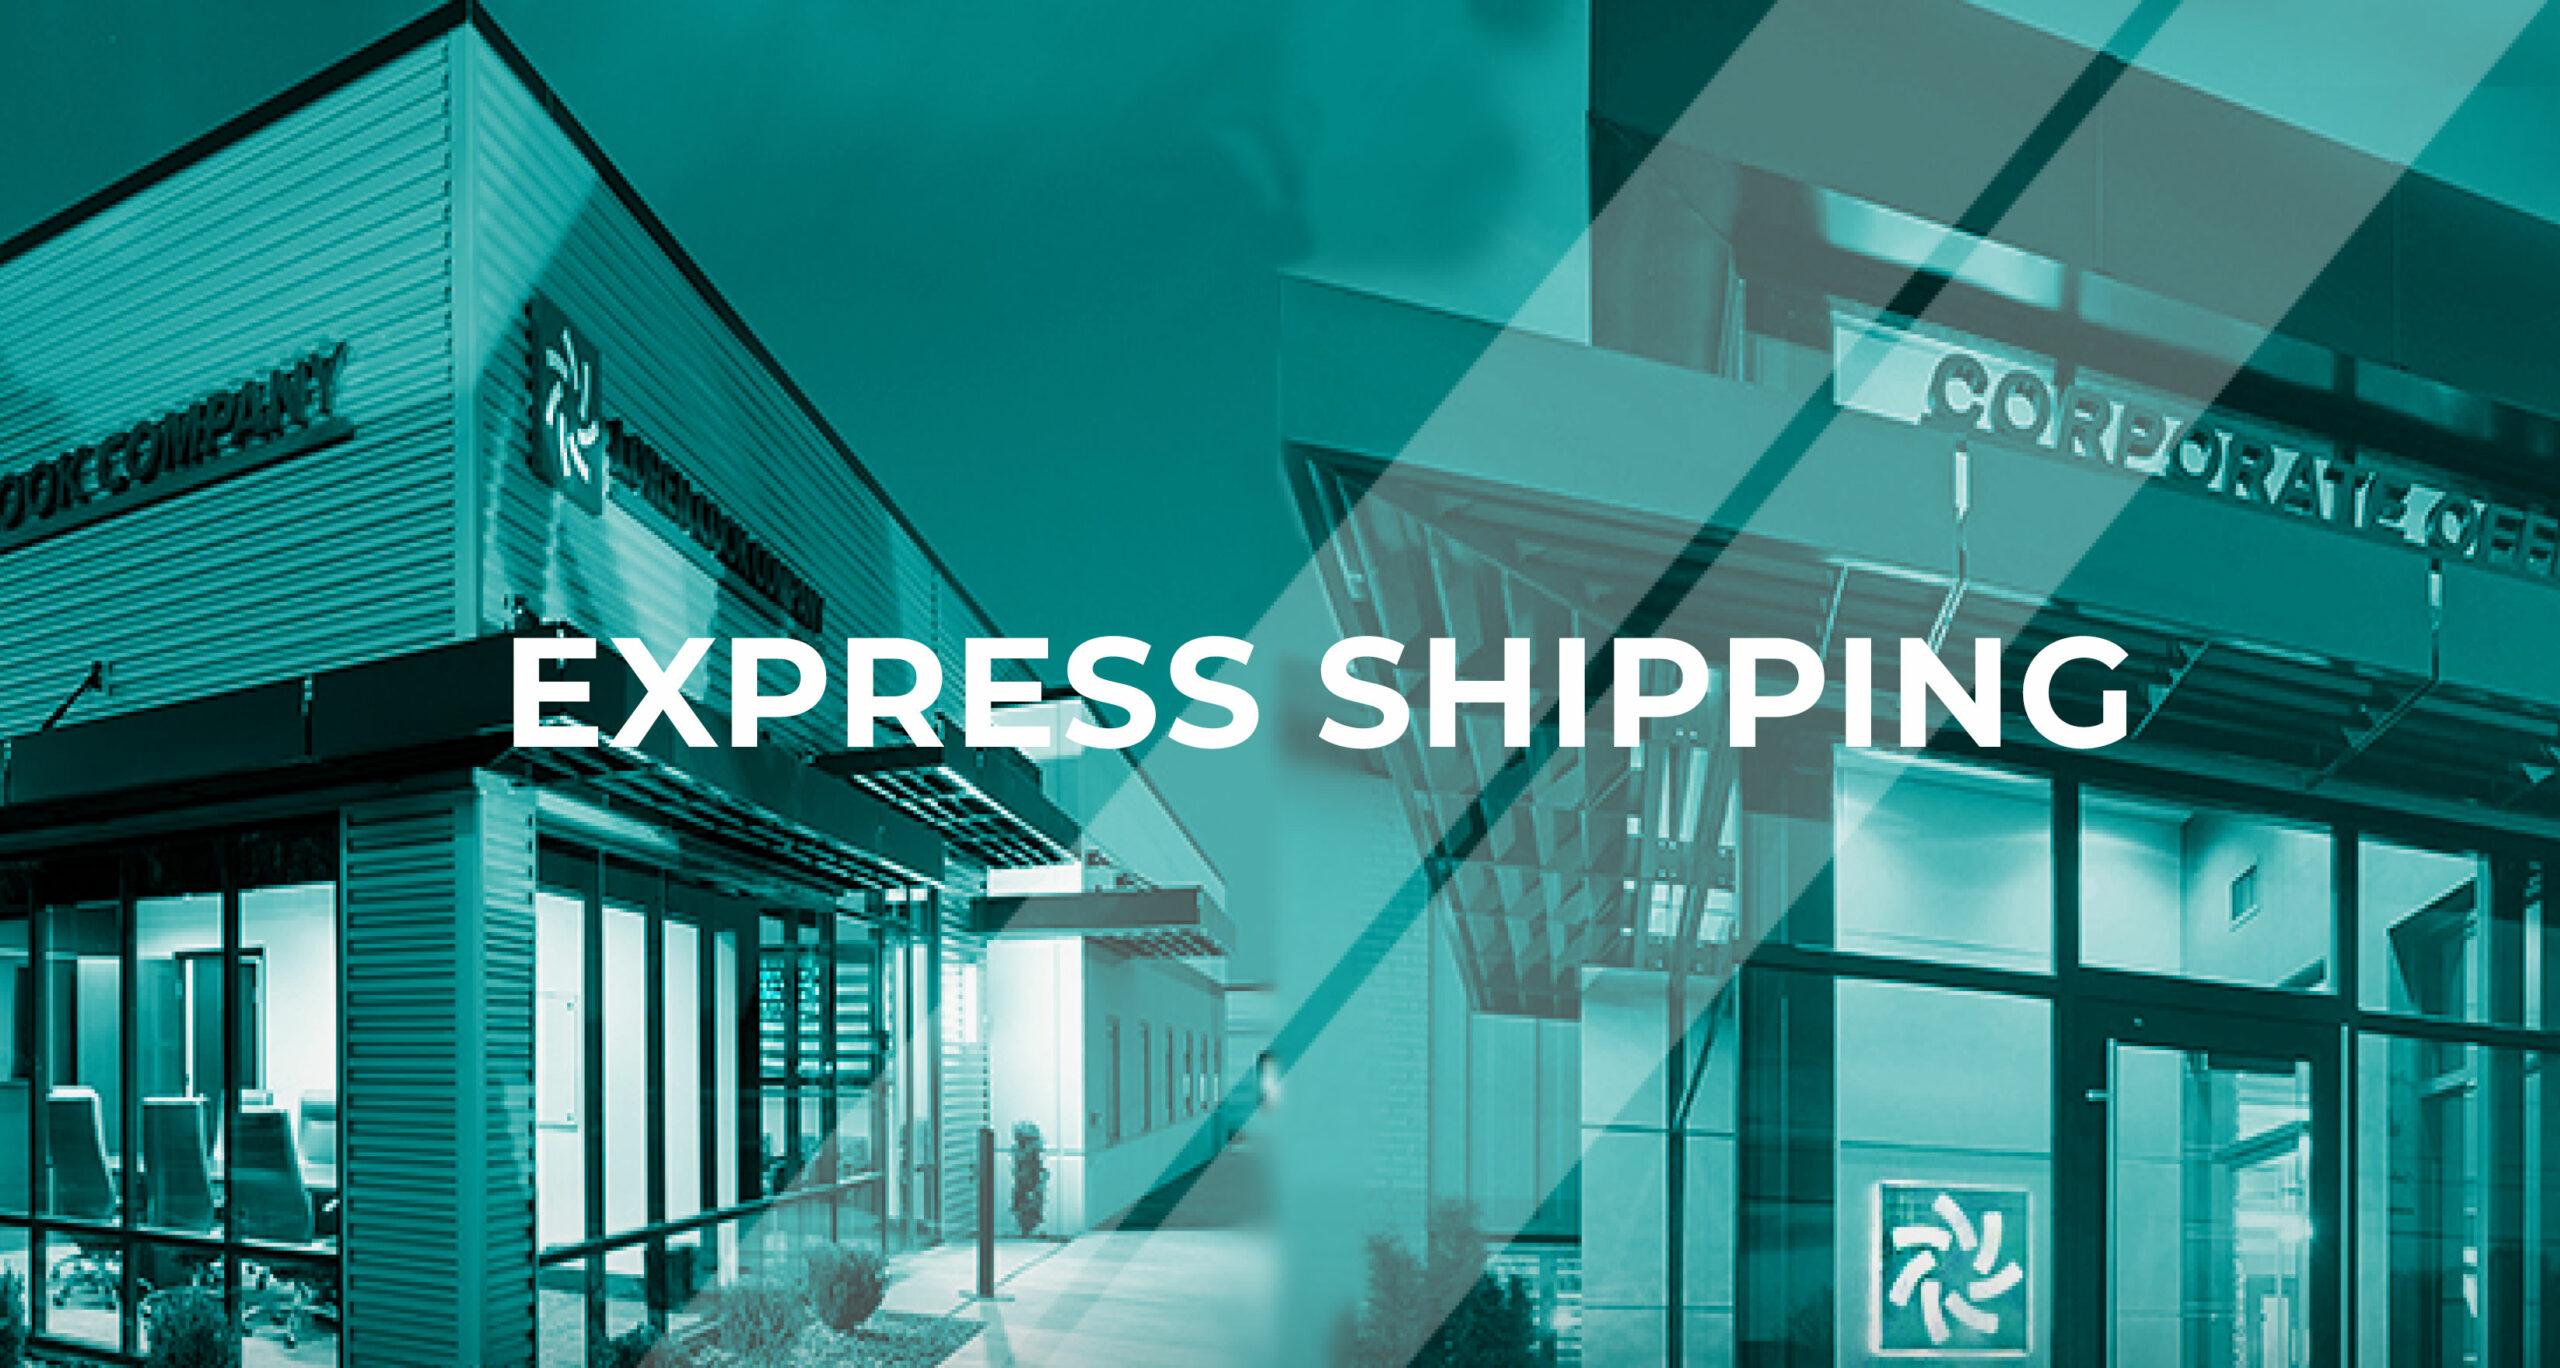 express_shipping_full